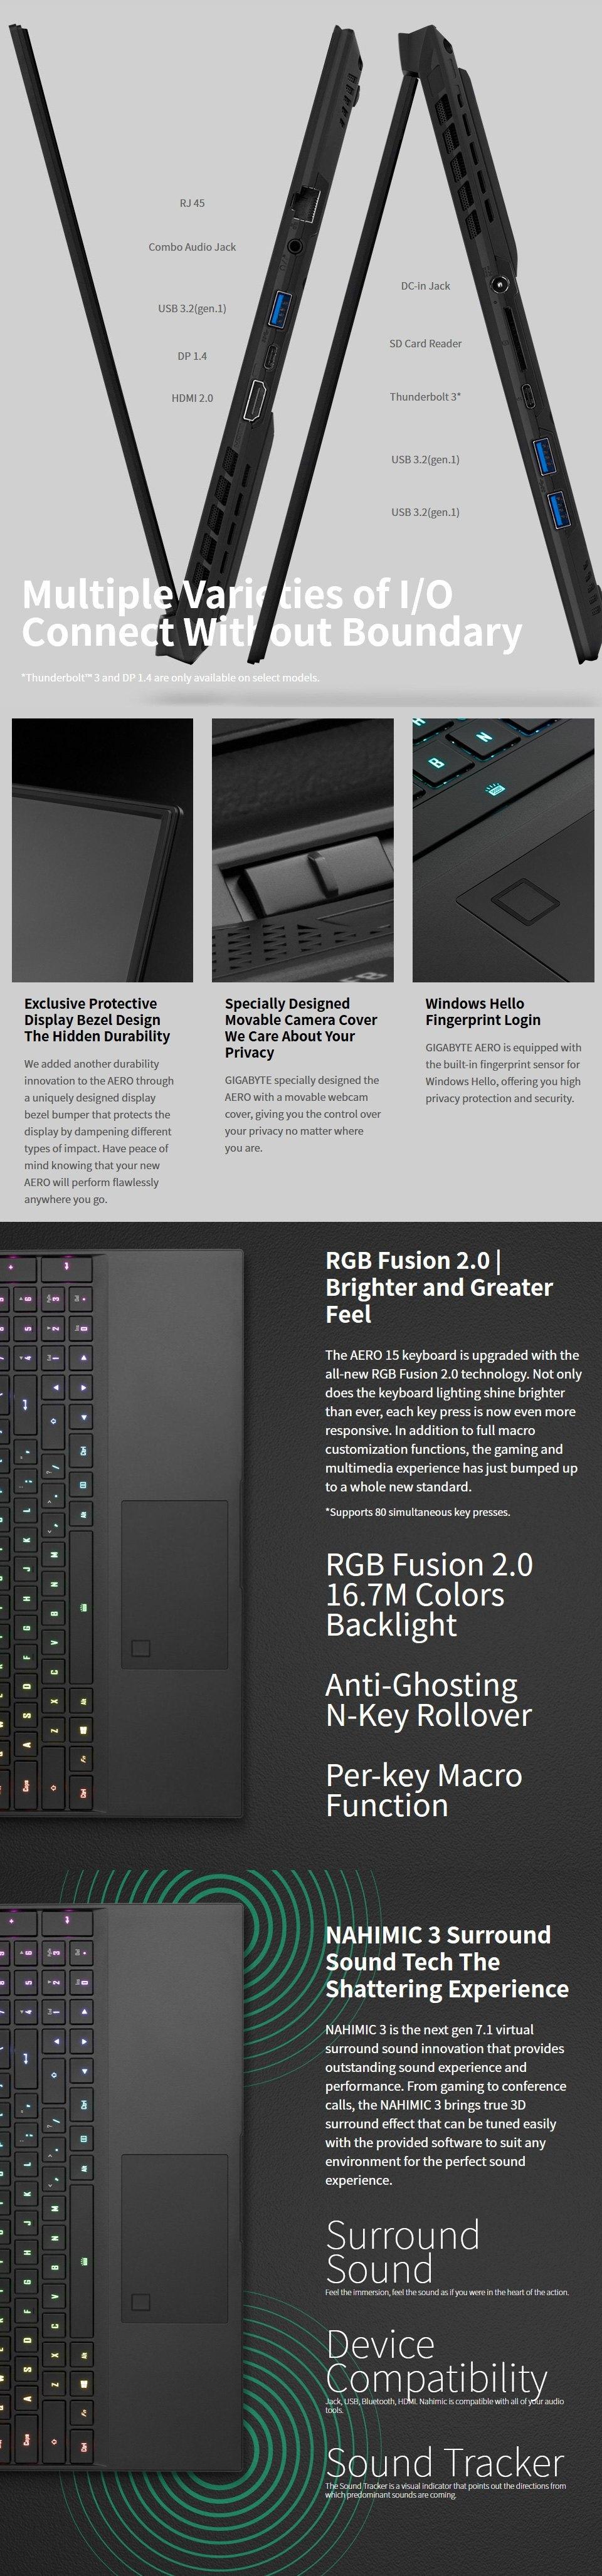 Gigabyte AERO 15 Core I7 RTX 2070 Super 15.6in OLED UHD Laptop features 5